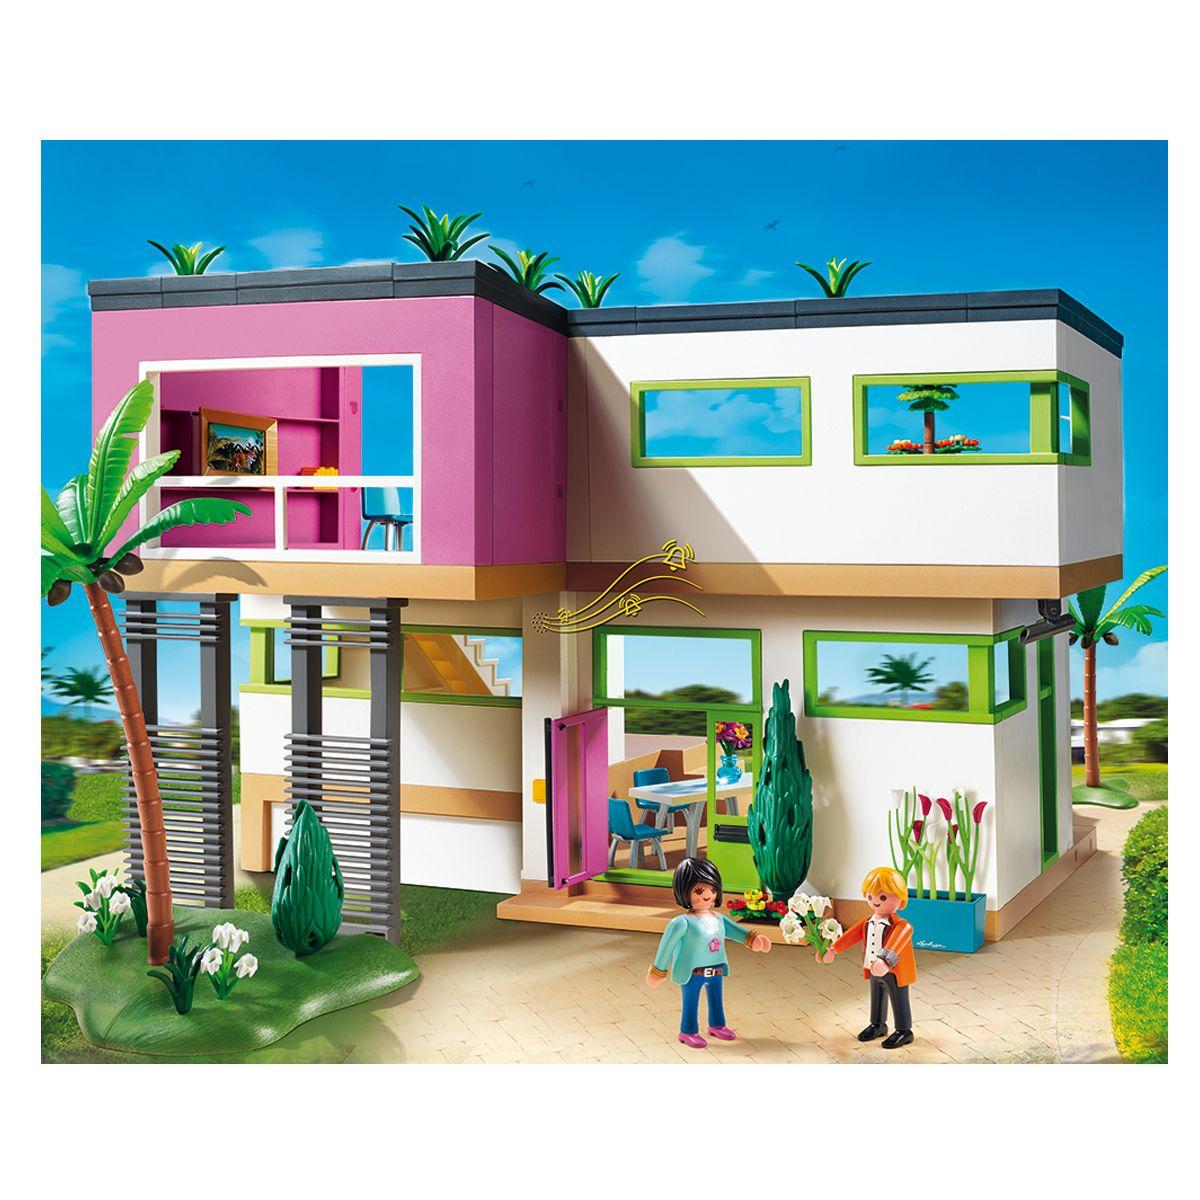 Maison Moderne Playmobil City Life - 5574 - Mini-Univers ... encequiconcerne Piscine Playmobil 5575